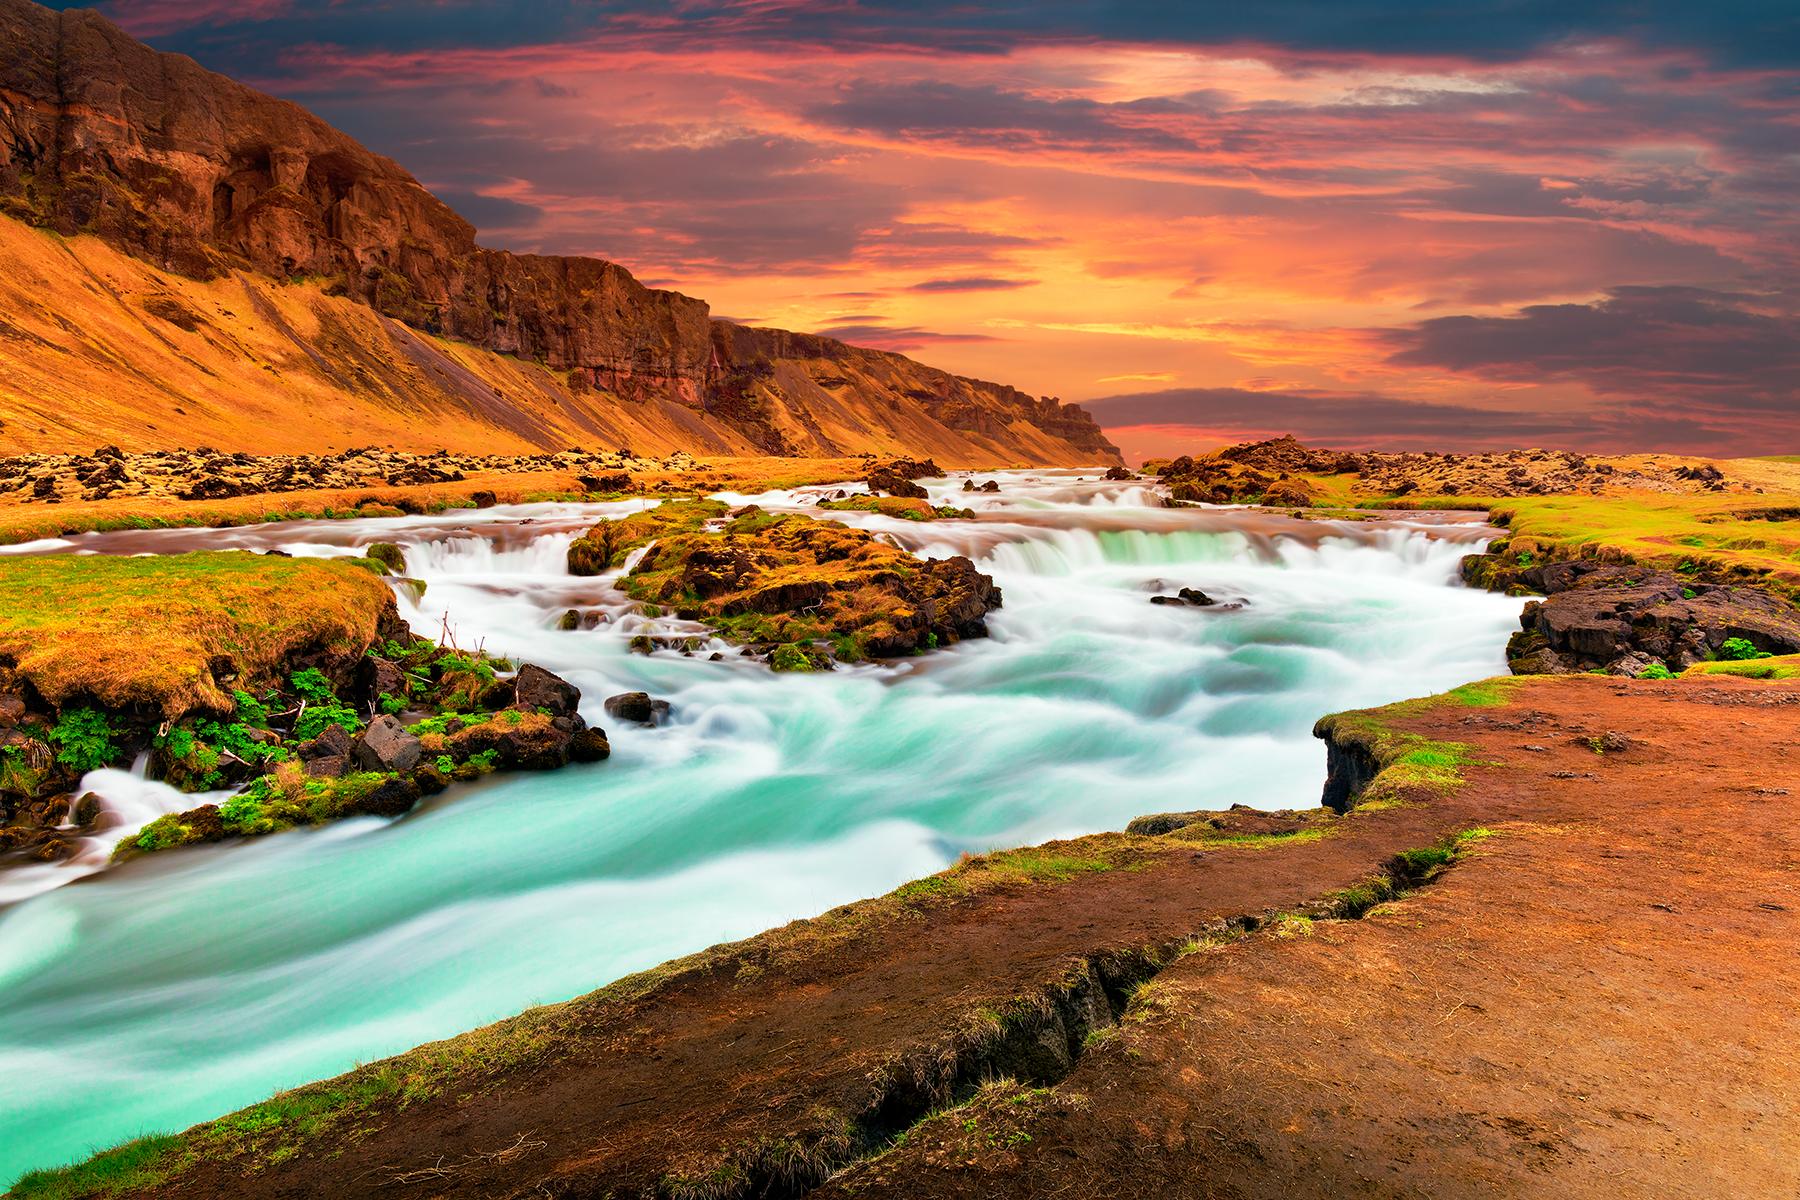 Iceland sunset silk stream photo